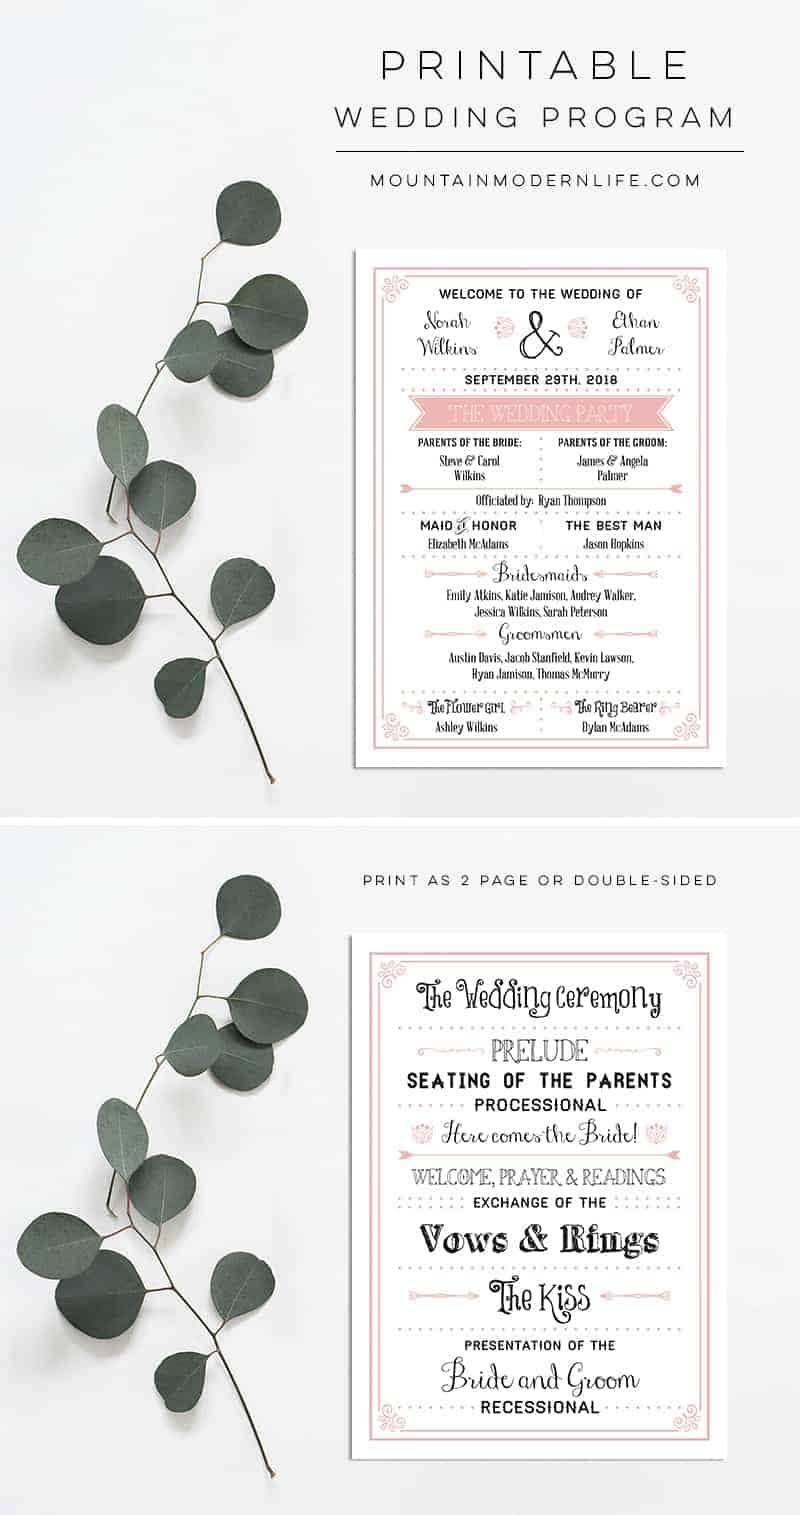 Printable Wedding Program | MountainModernLife.com